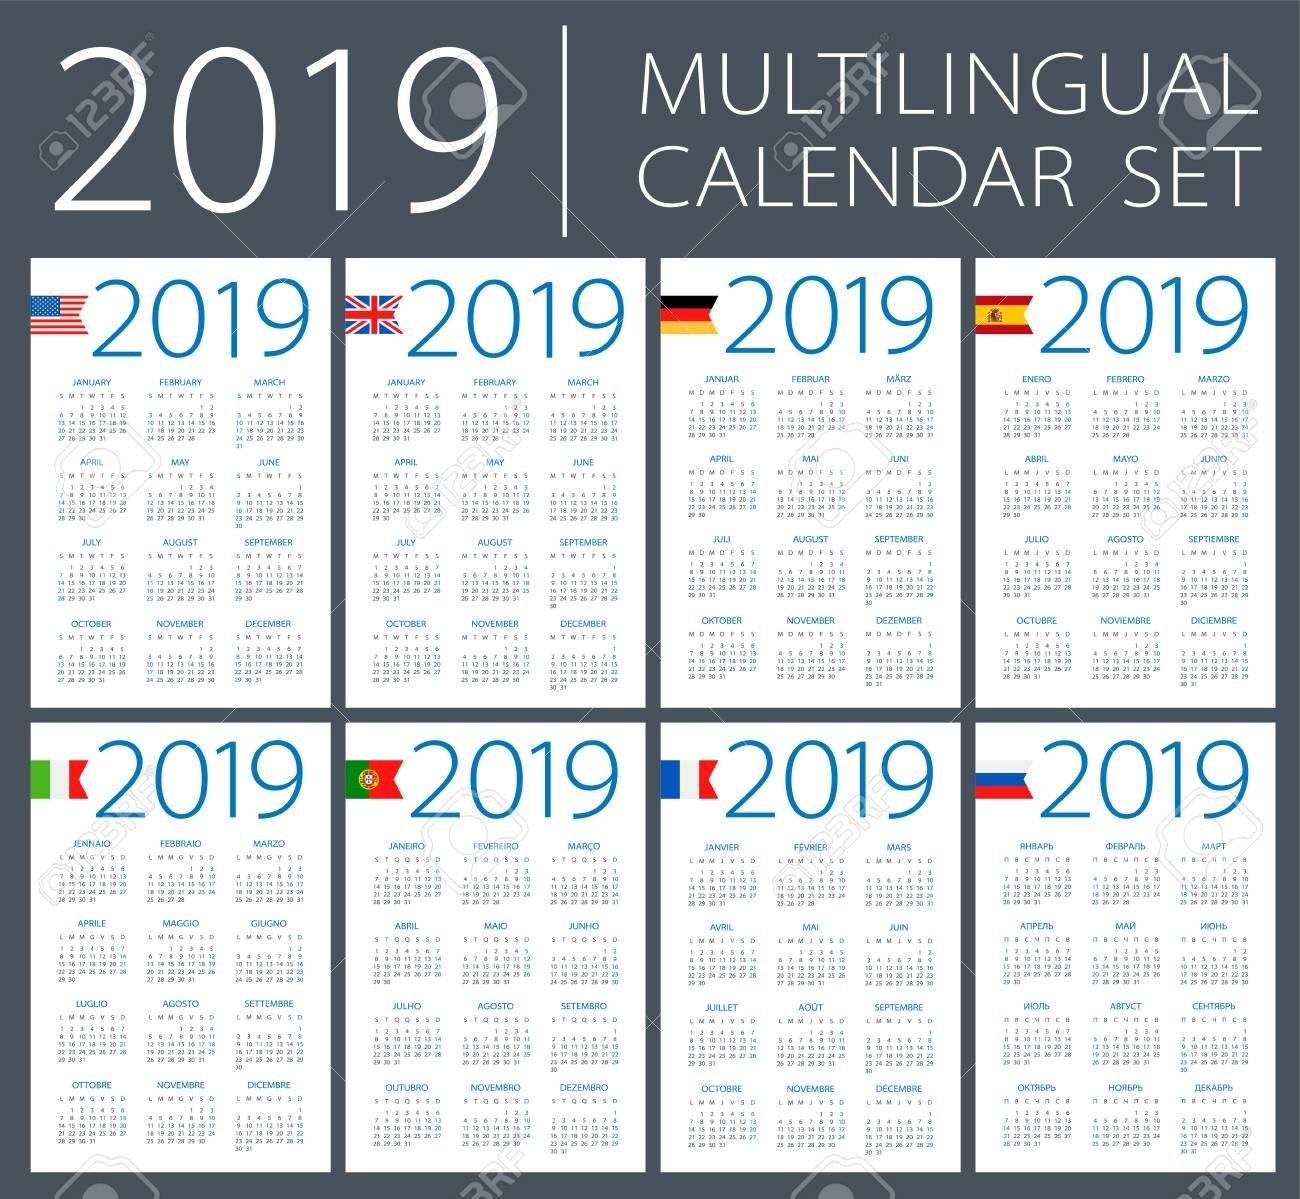 Calendar 2019 Set – English, American, Spanish, German, Portuguese Calendar 2019 America